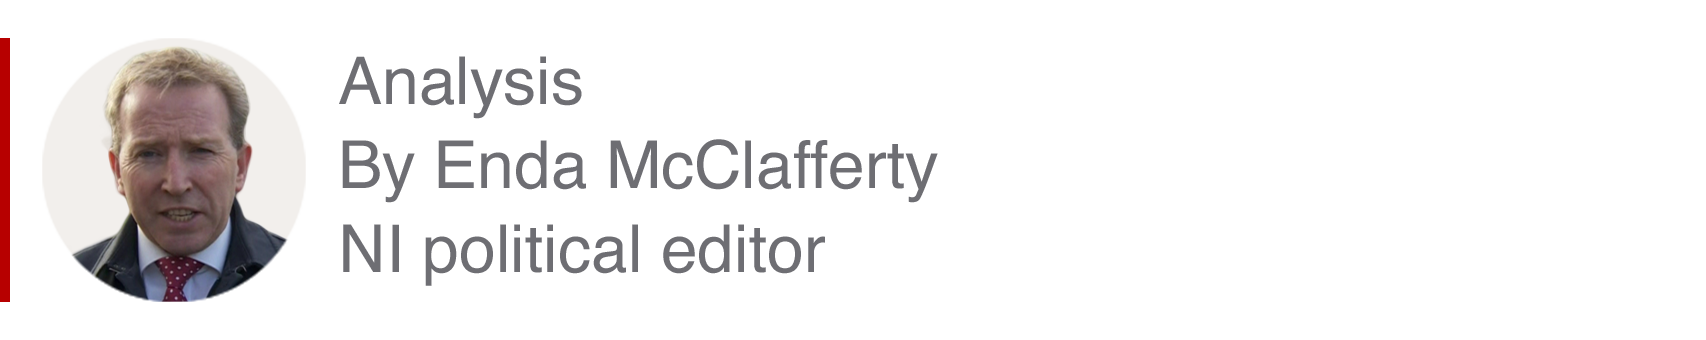 Analysis box by Enda McClafferty, NI political editor